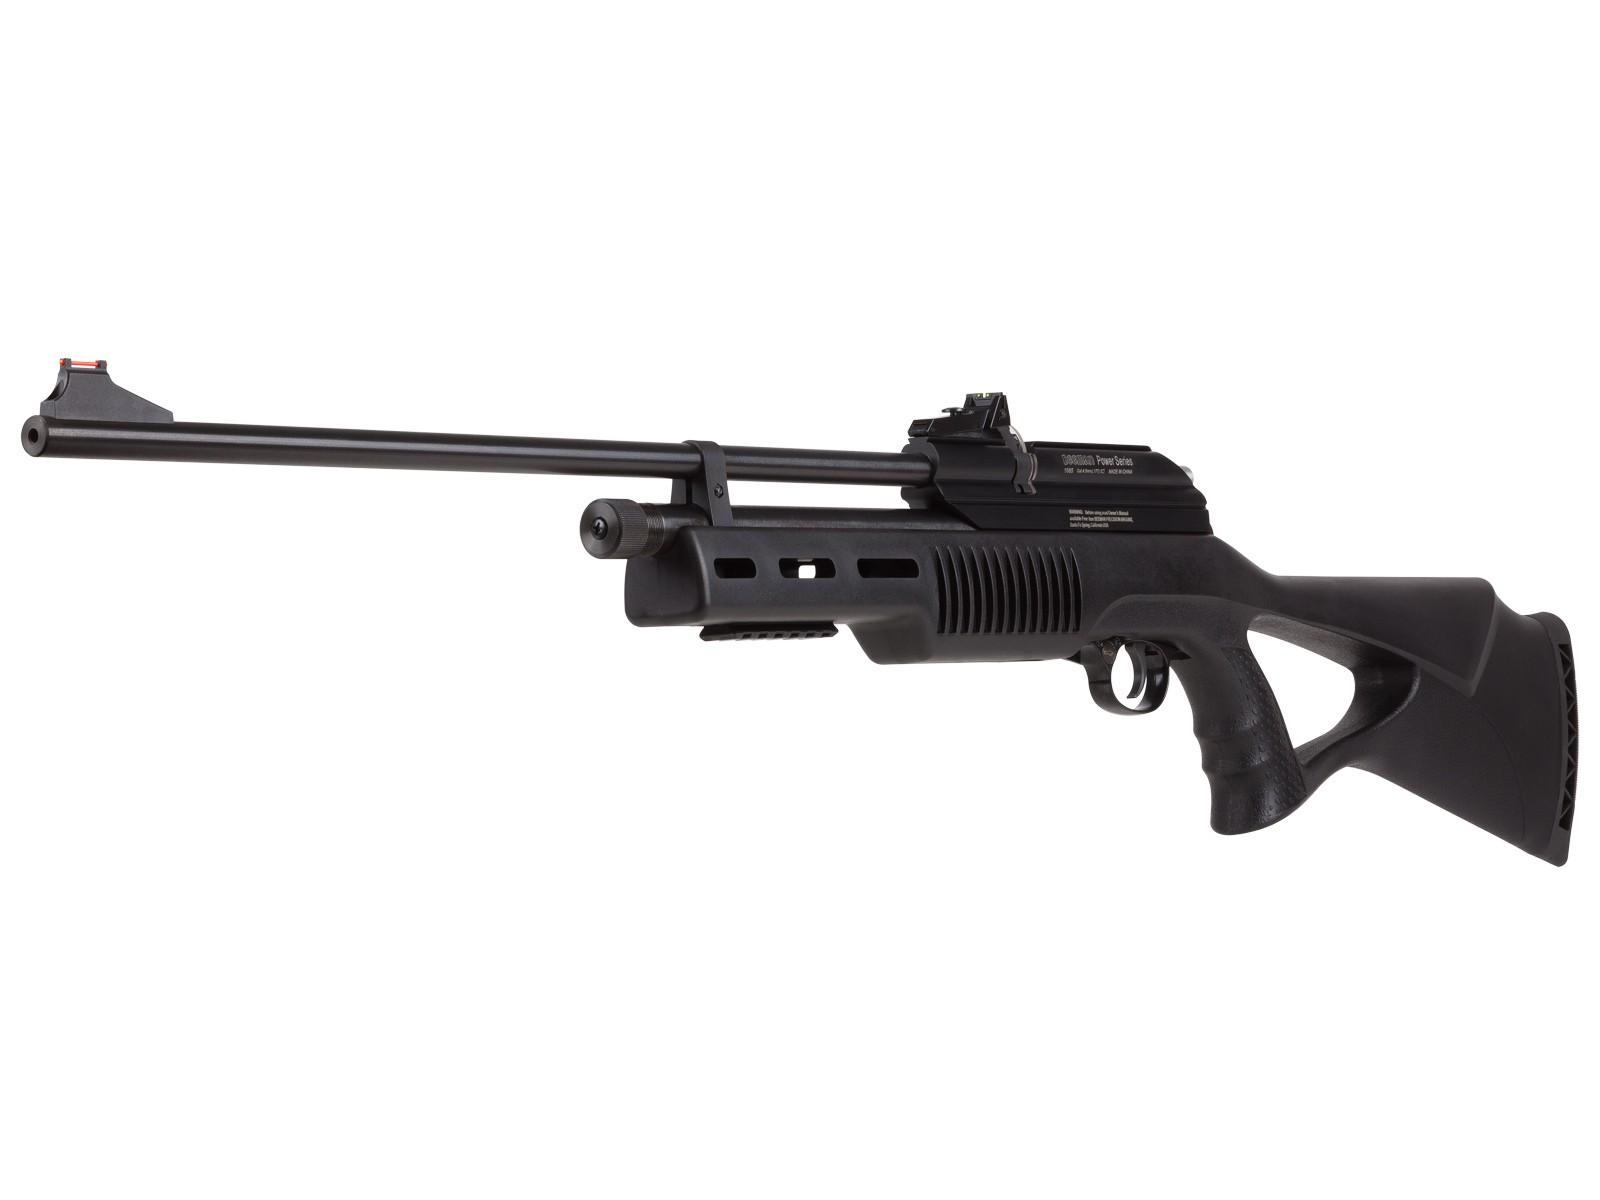 Beeman Model 1085 QB II CO2 Repeater Air Rifle 0.177